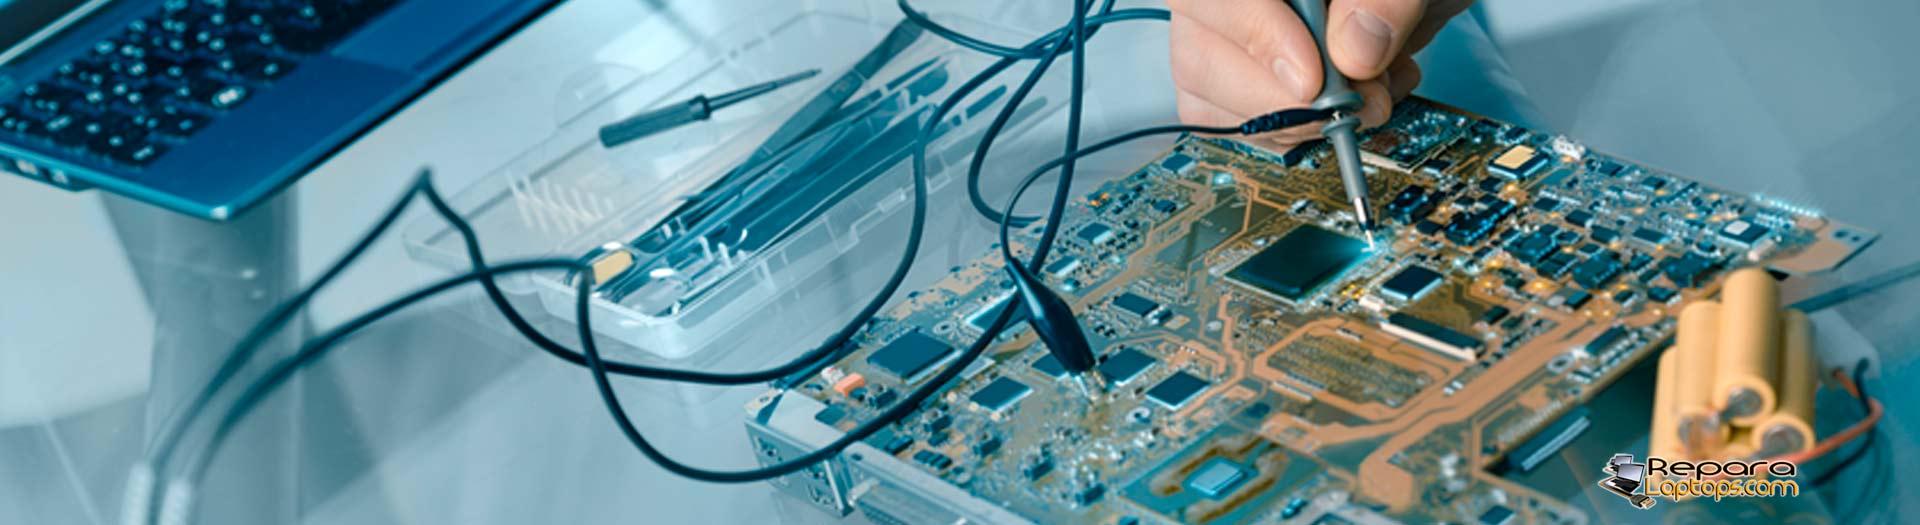 Reparación Computadoras Portátiles Costa Rica Servicio Tecnico